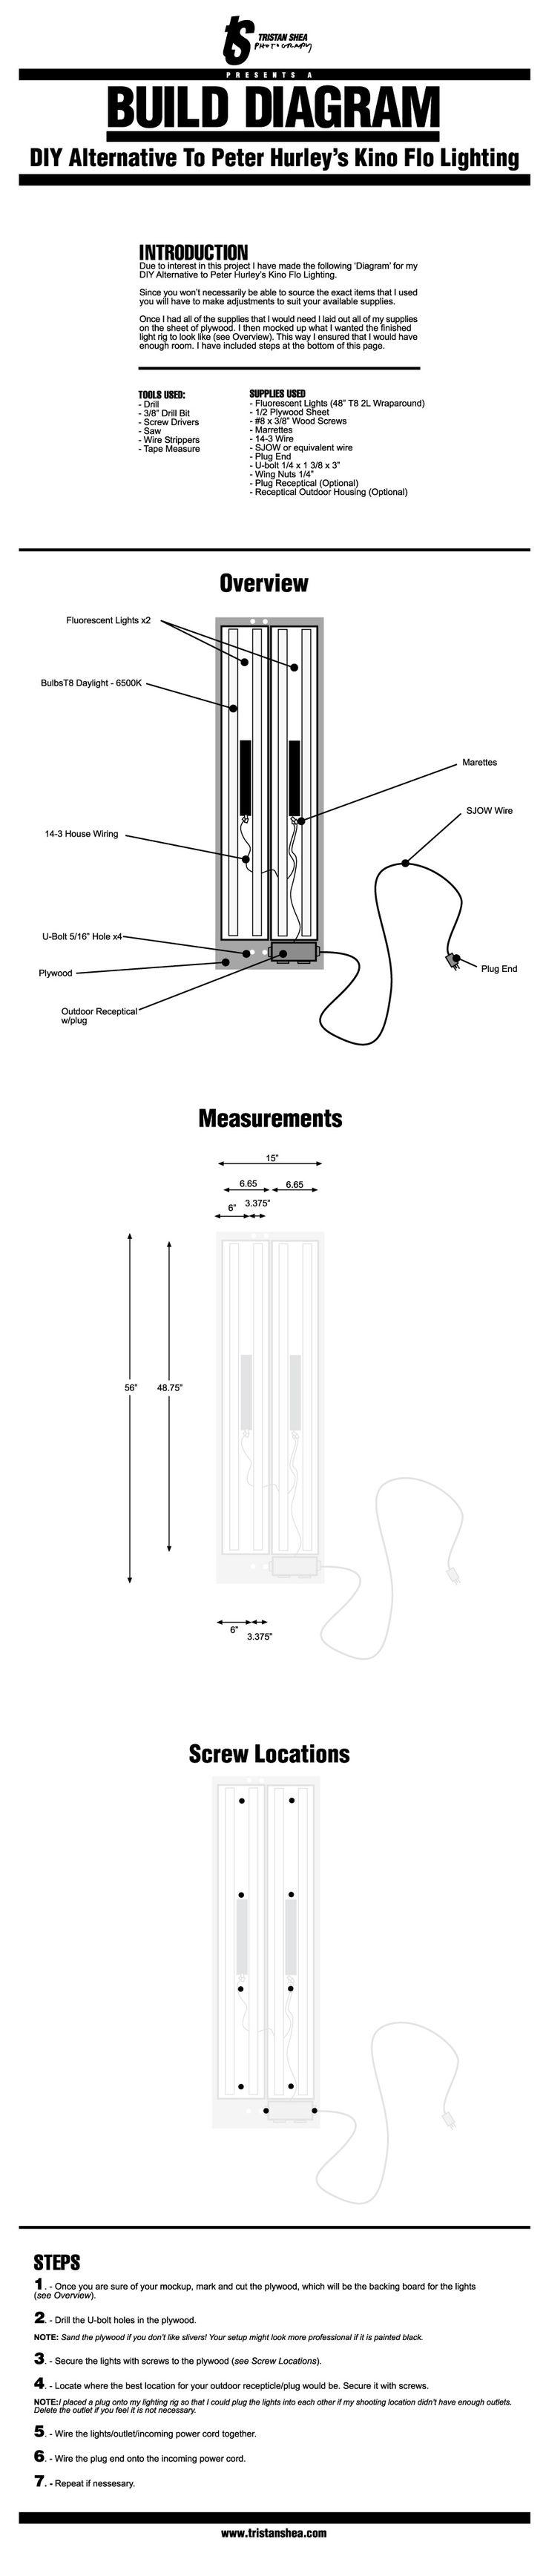 DIY Diagram - Headshot Lighting u0027DIY Alternative To Peter Hurleyu0027s Kino Flo Lightingu0027  sc 1 st  Pinterest & 517 best DIY Photography Studio images on Pinterest | Photography ... azcodes.com